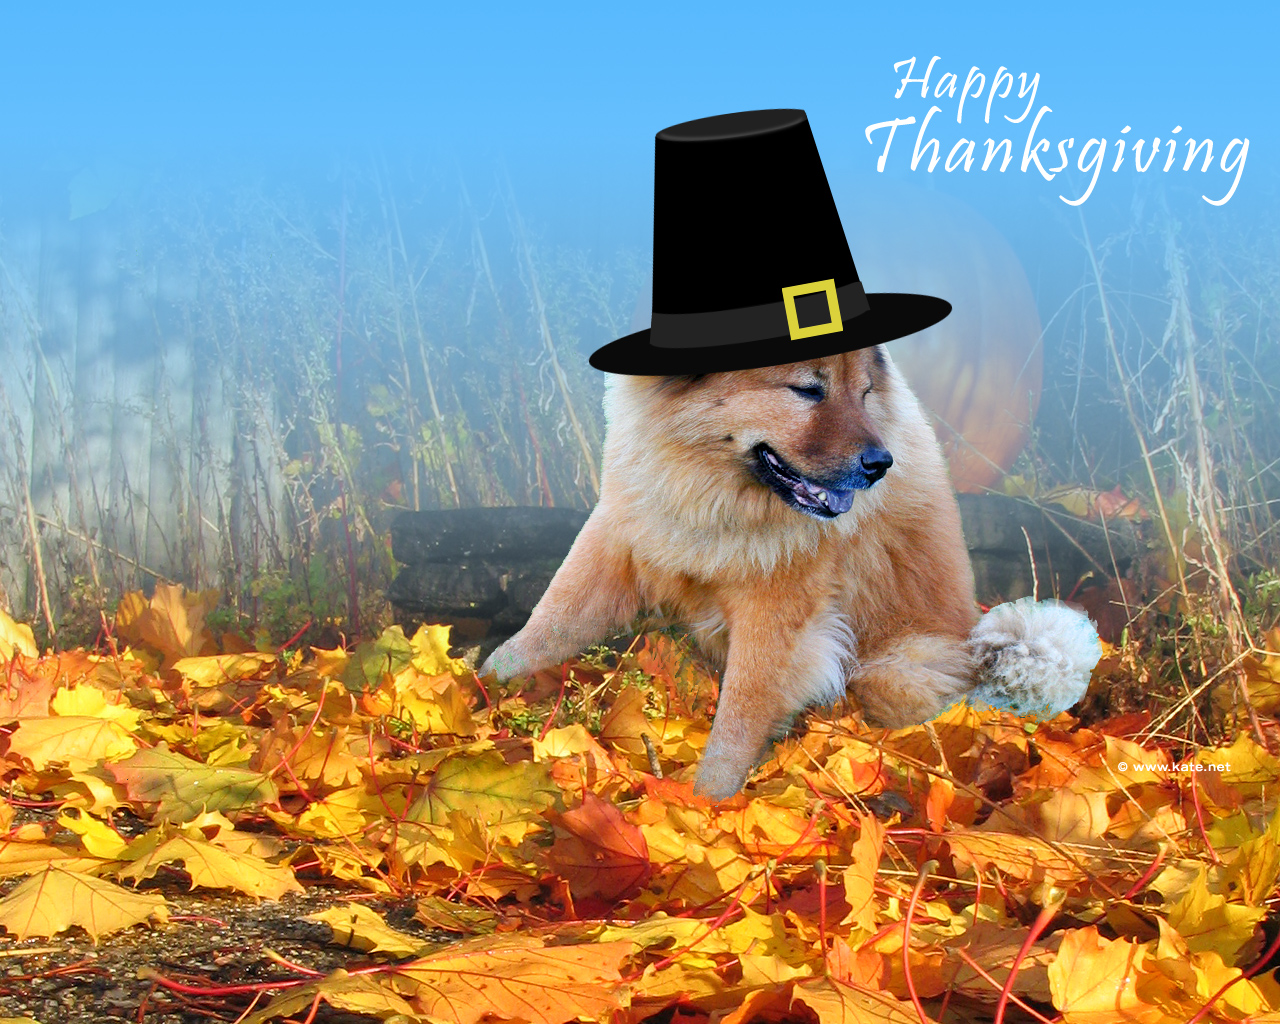 Free download 2012 thanksgiving day wallpapers part 1 - Wallpaper desktop thanksgiving ...